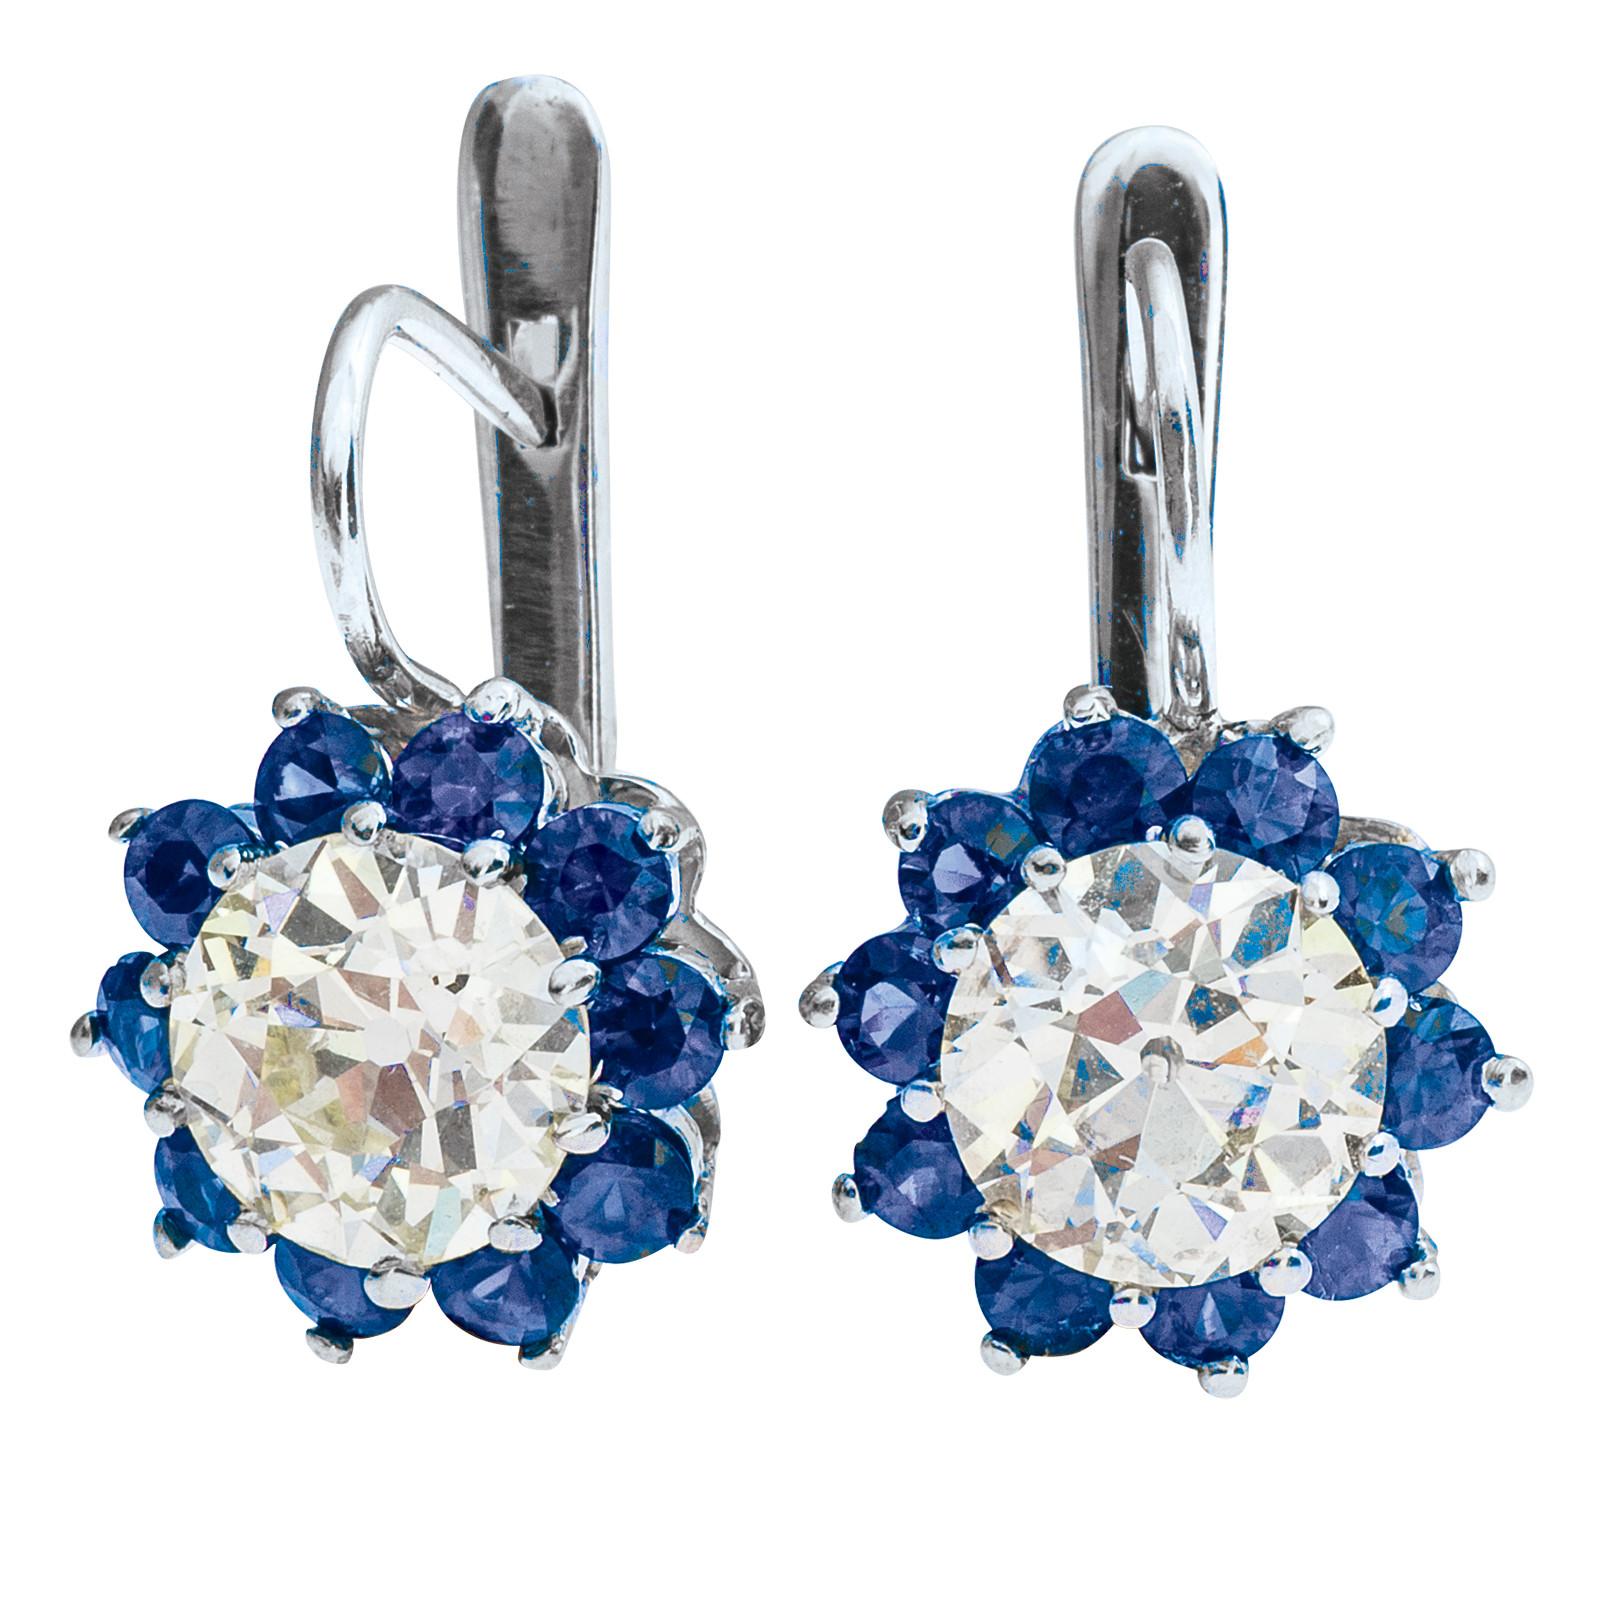 New 4.03 CTW Diamond & 2.29 CTW Sapphire Earrings